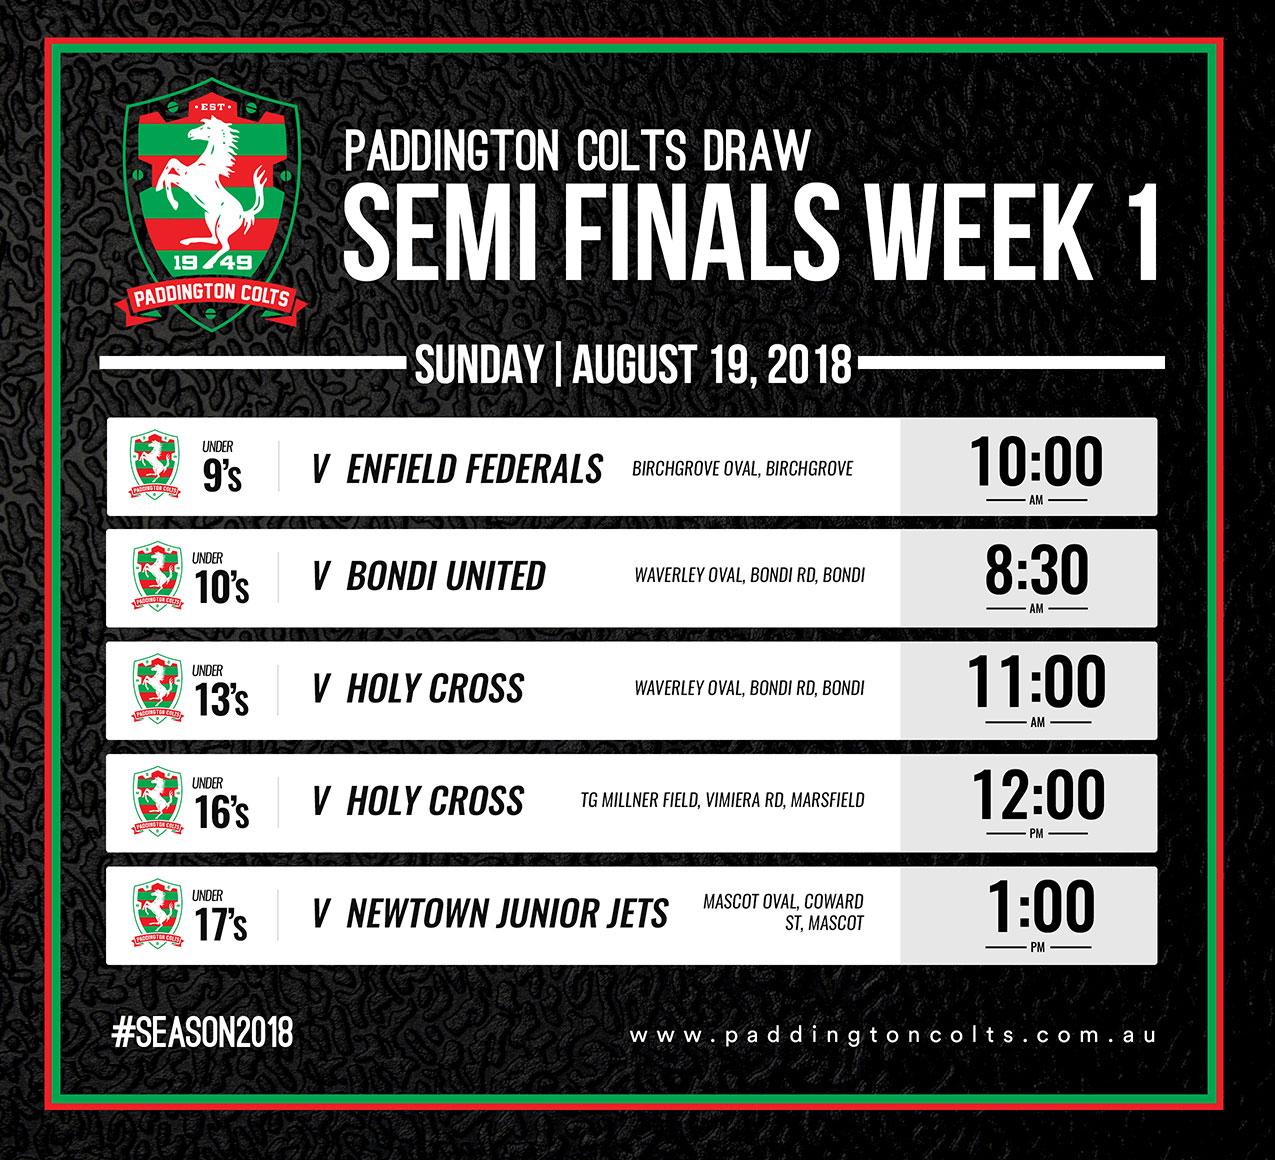 Paddington-Colts-Semi-finals-week-1---August-19,-2018.jpg